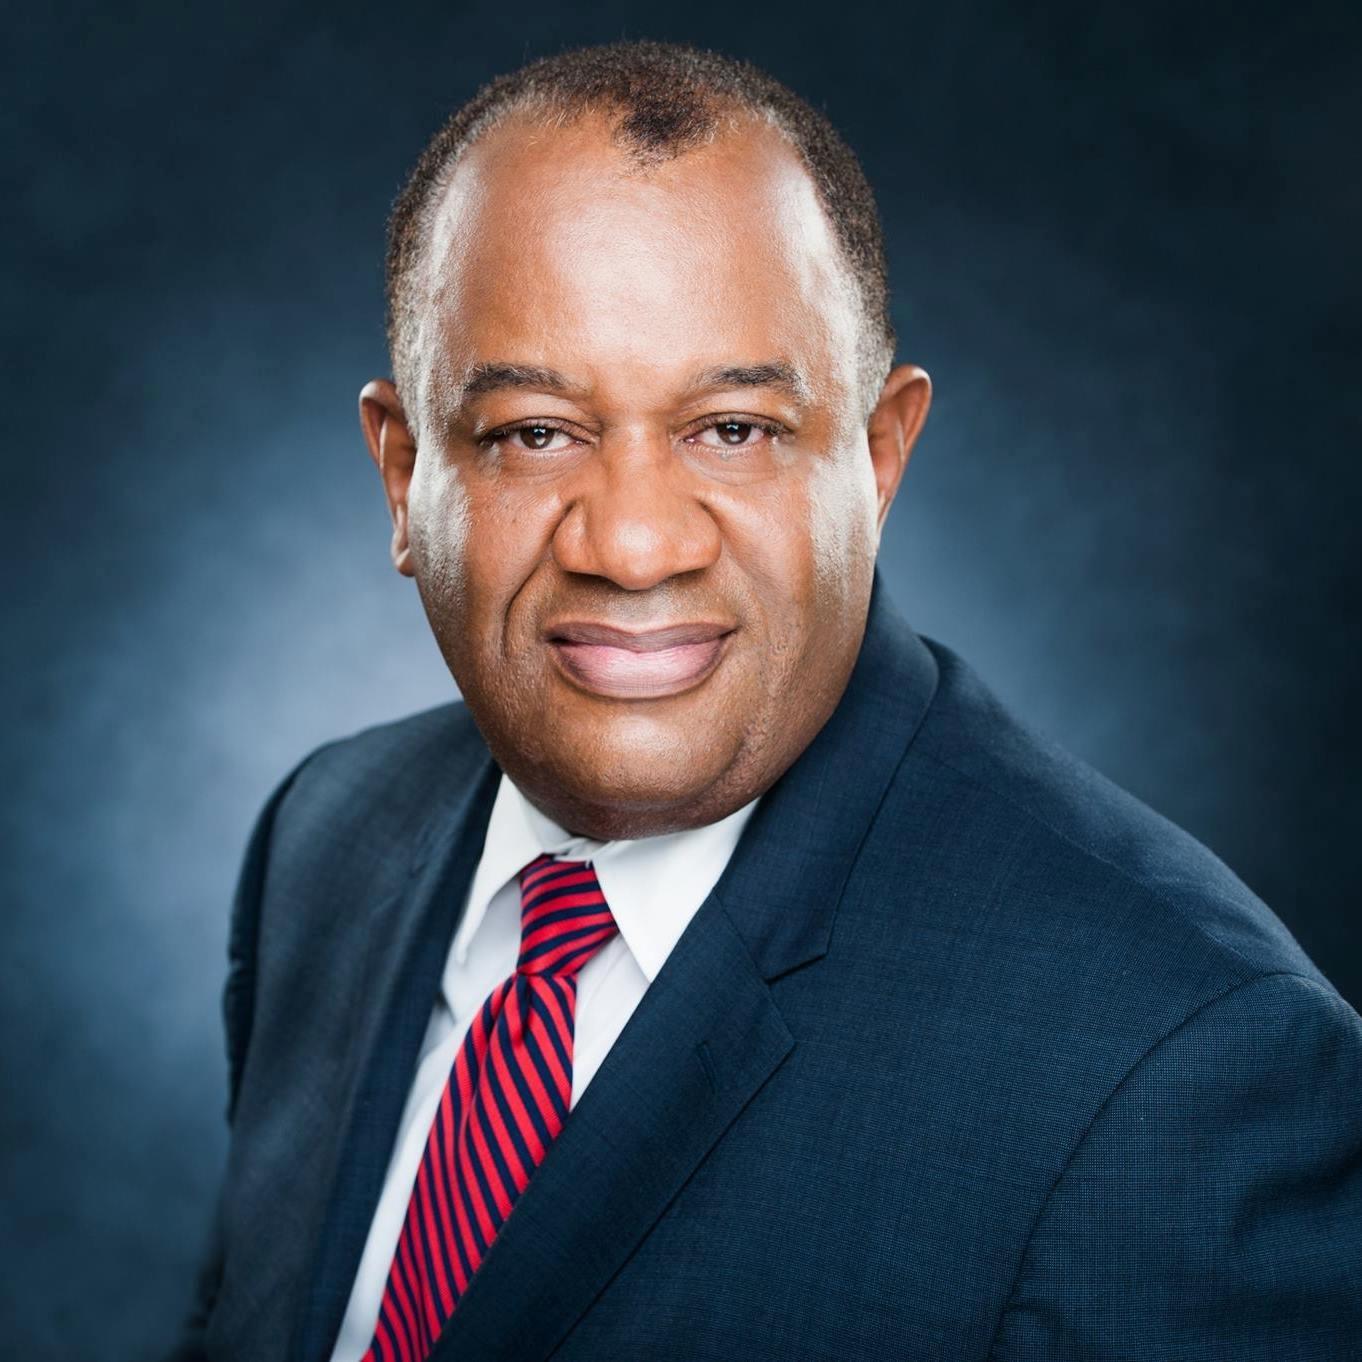 LINWOOD PARKER JONES Your Financial Professional & Insurance Agent